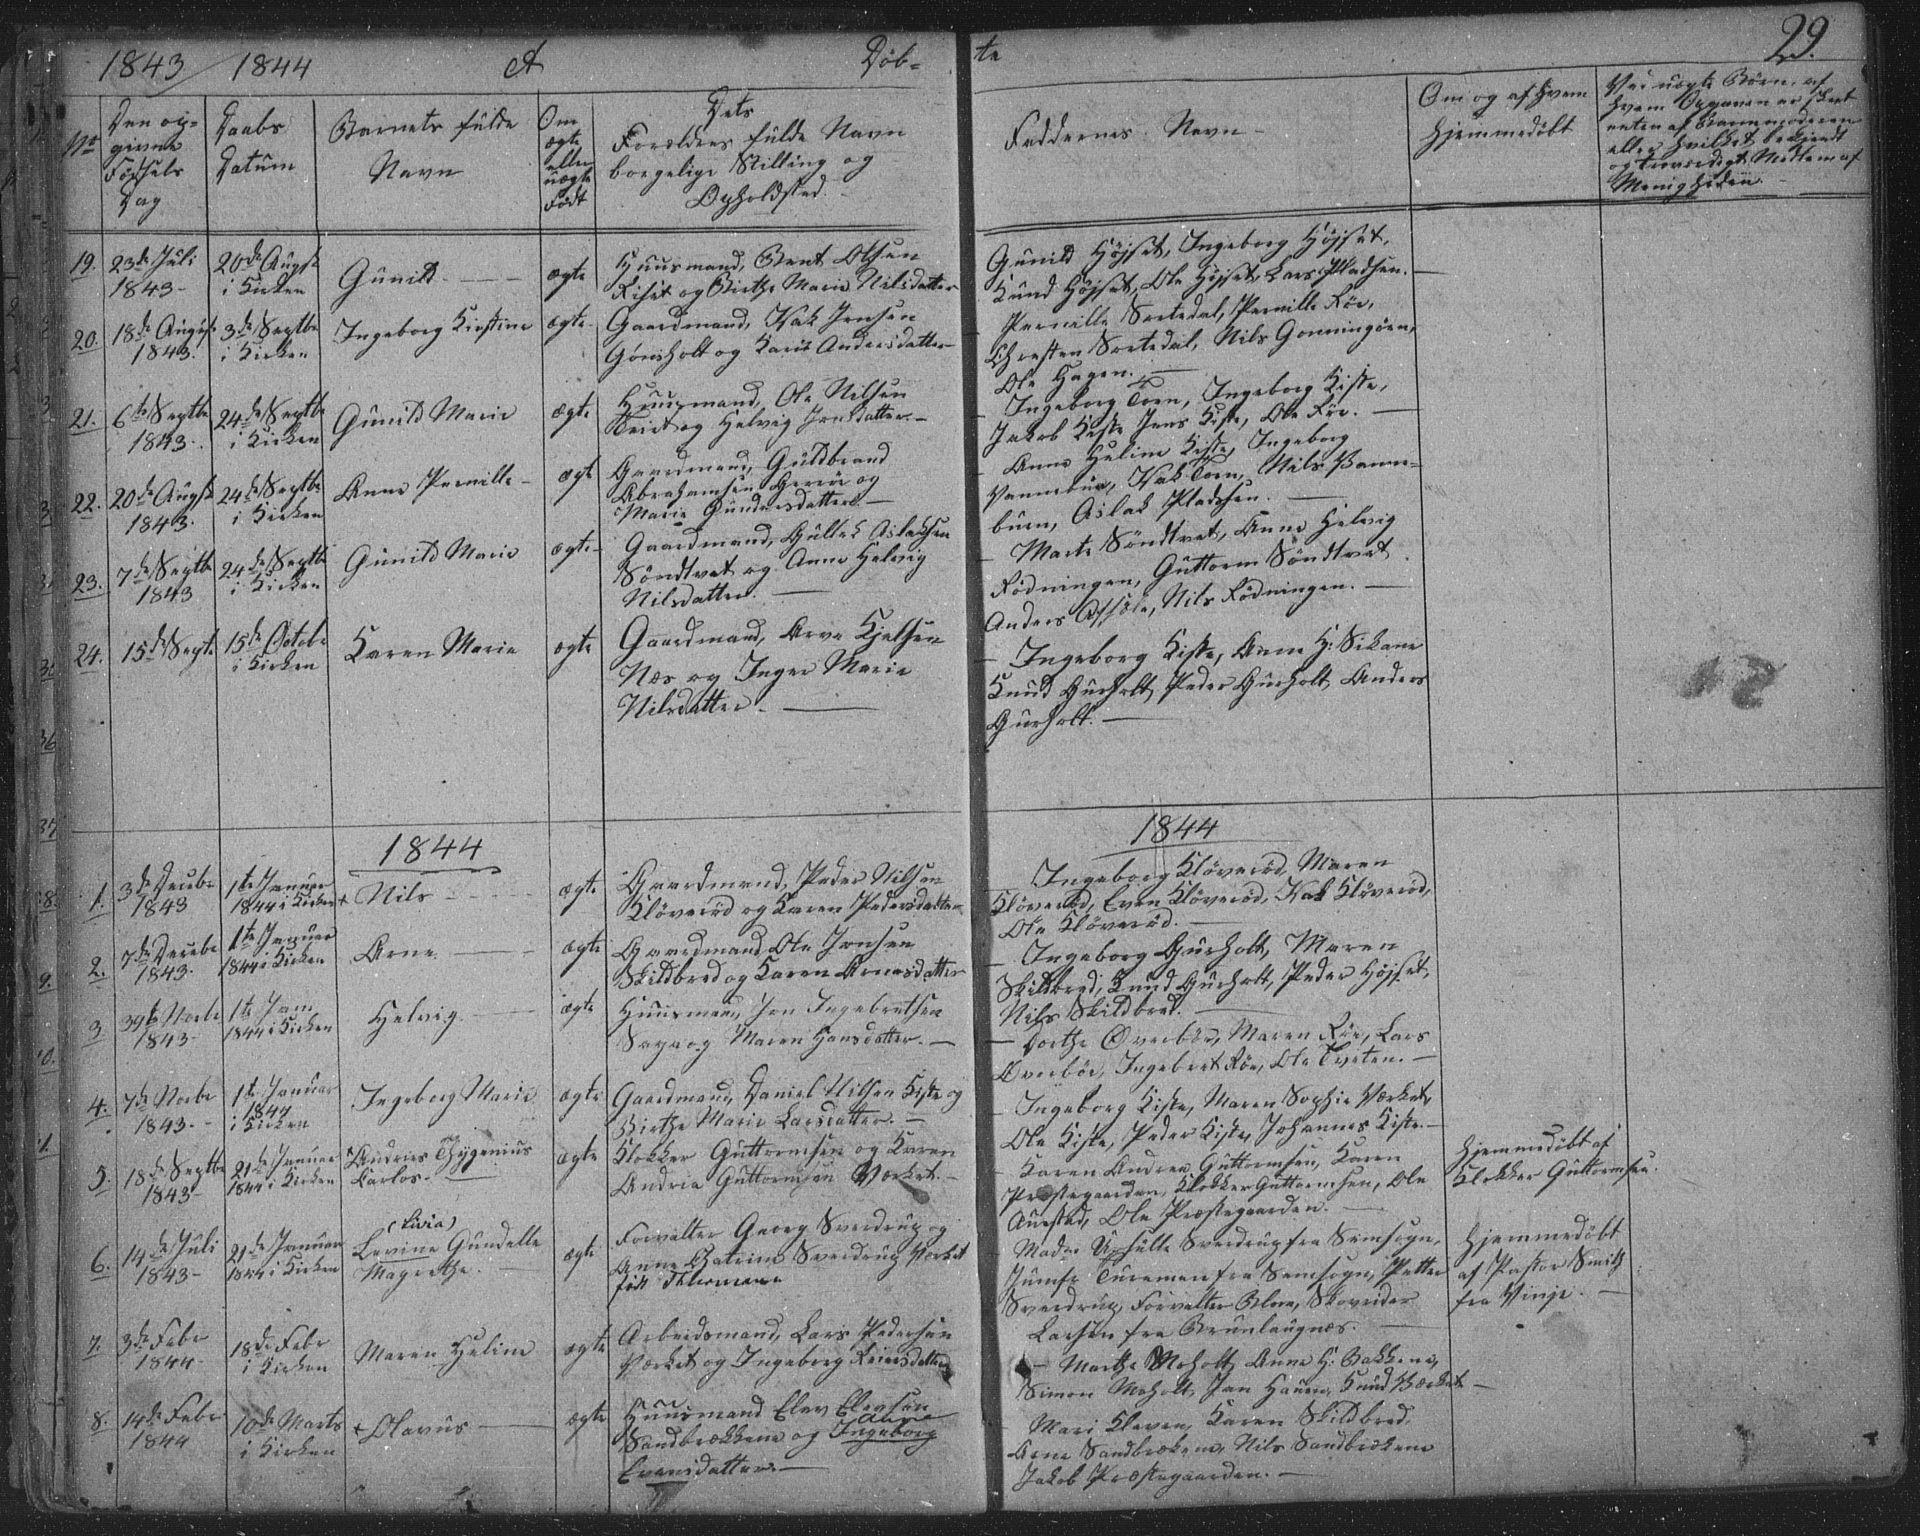 SAKO, Siljan kirkebøker, F/Fa/L0001: Parish register (official) no. 1, 1831-1870, p. 29